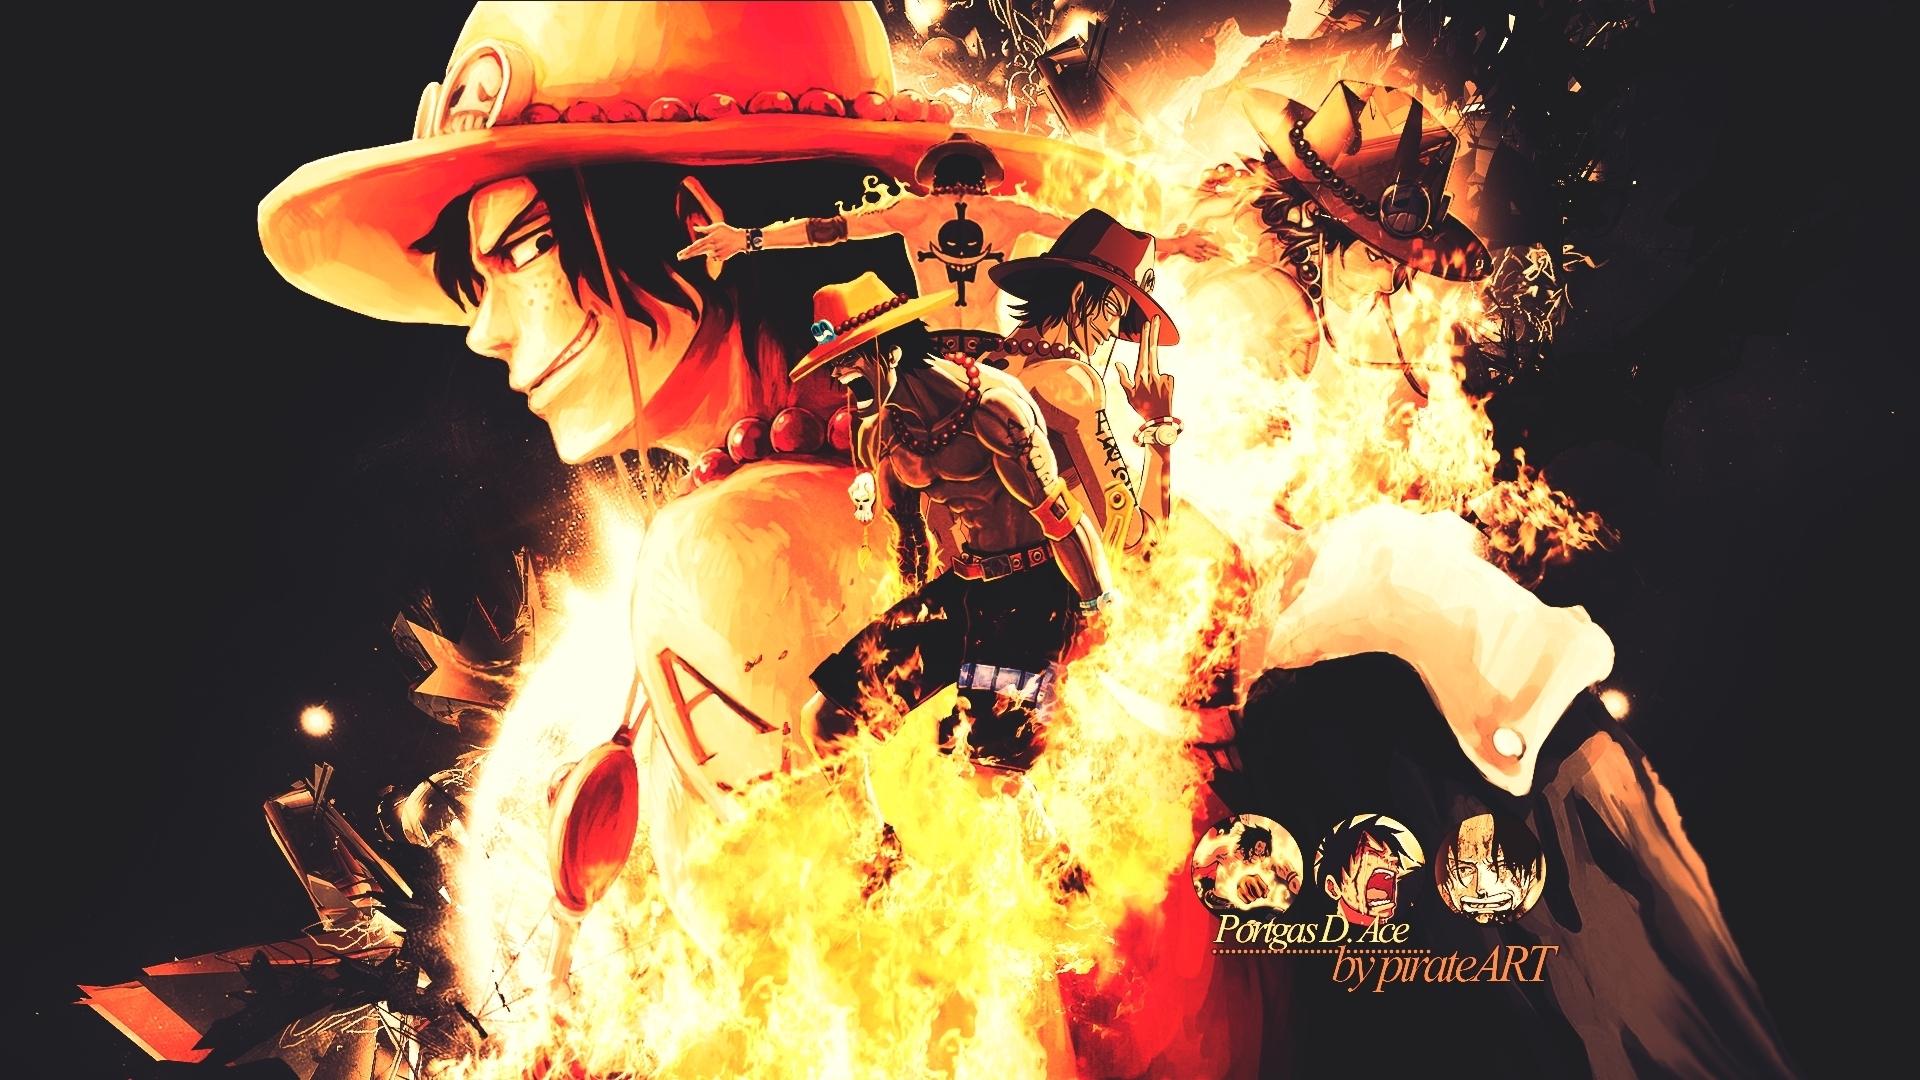 portgas d. ace - one piece - hd wallpaper #1495408 - zerochan anime